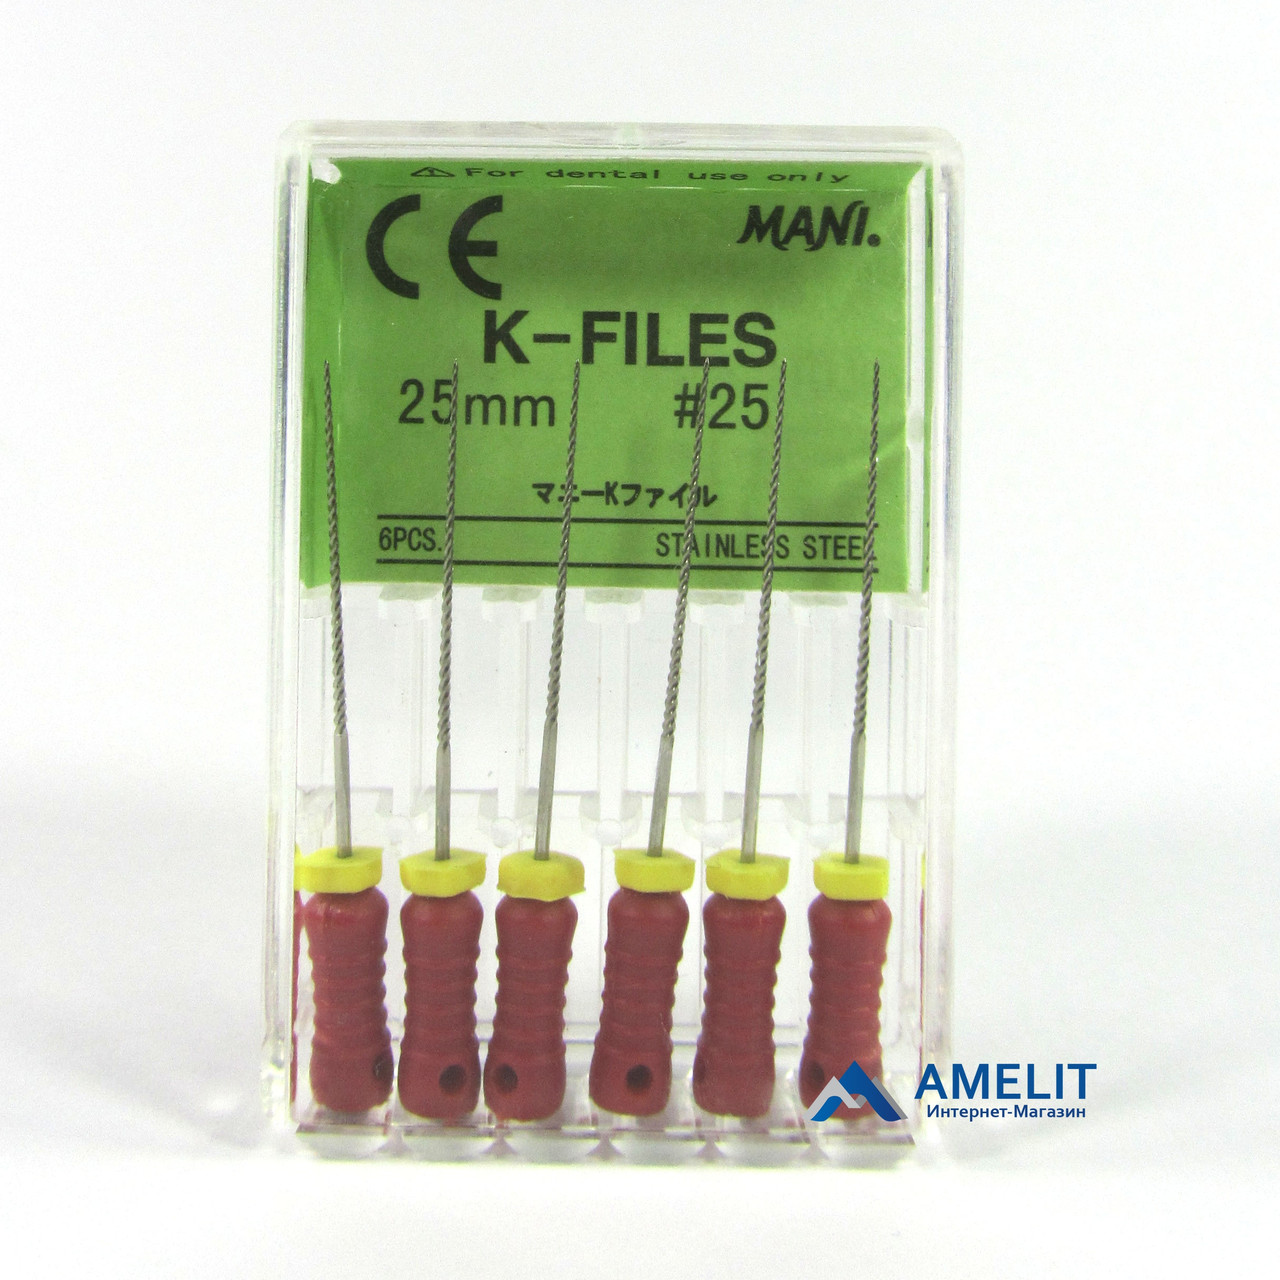 К-файл №25(К-file,Mani), 25мм, 6шт./уп